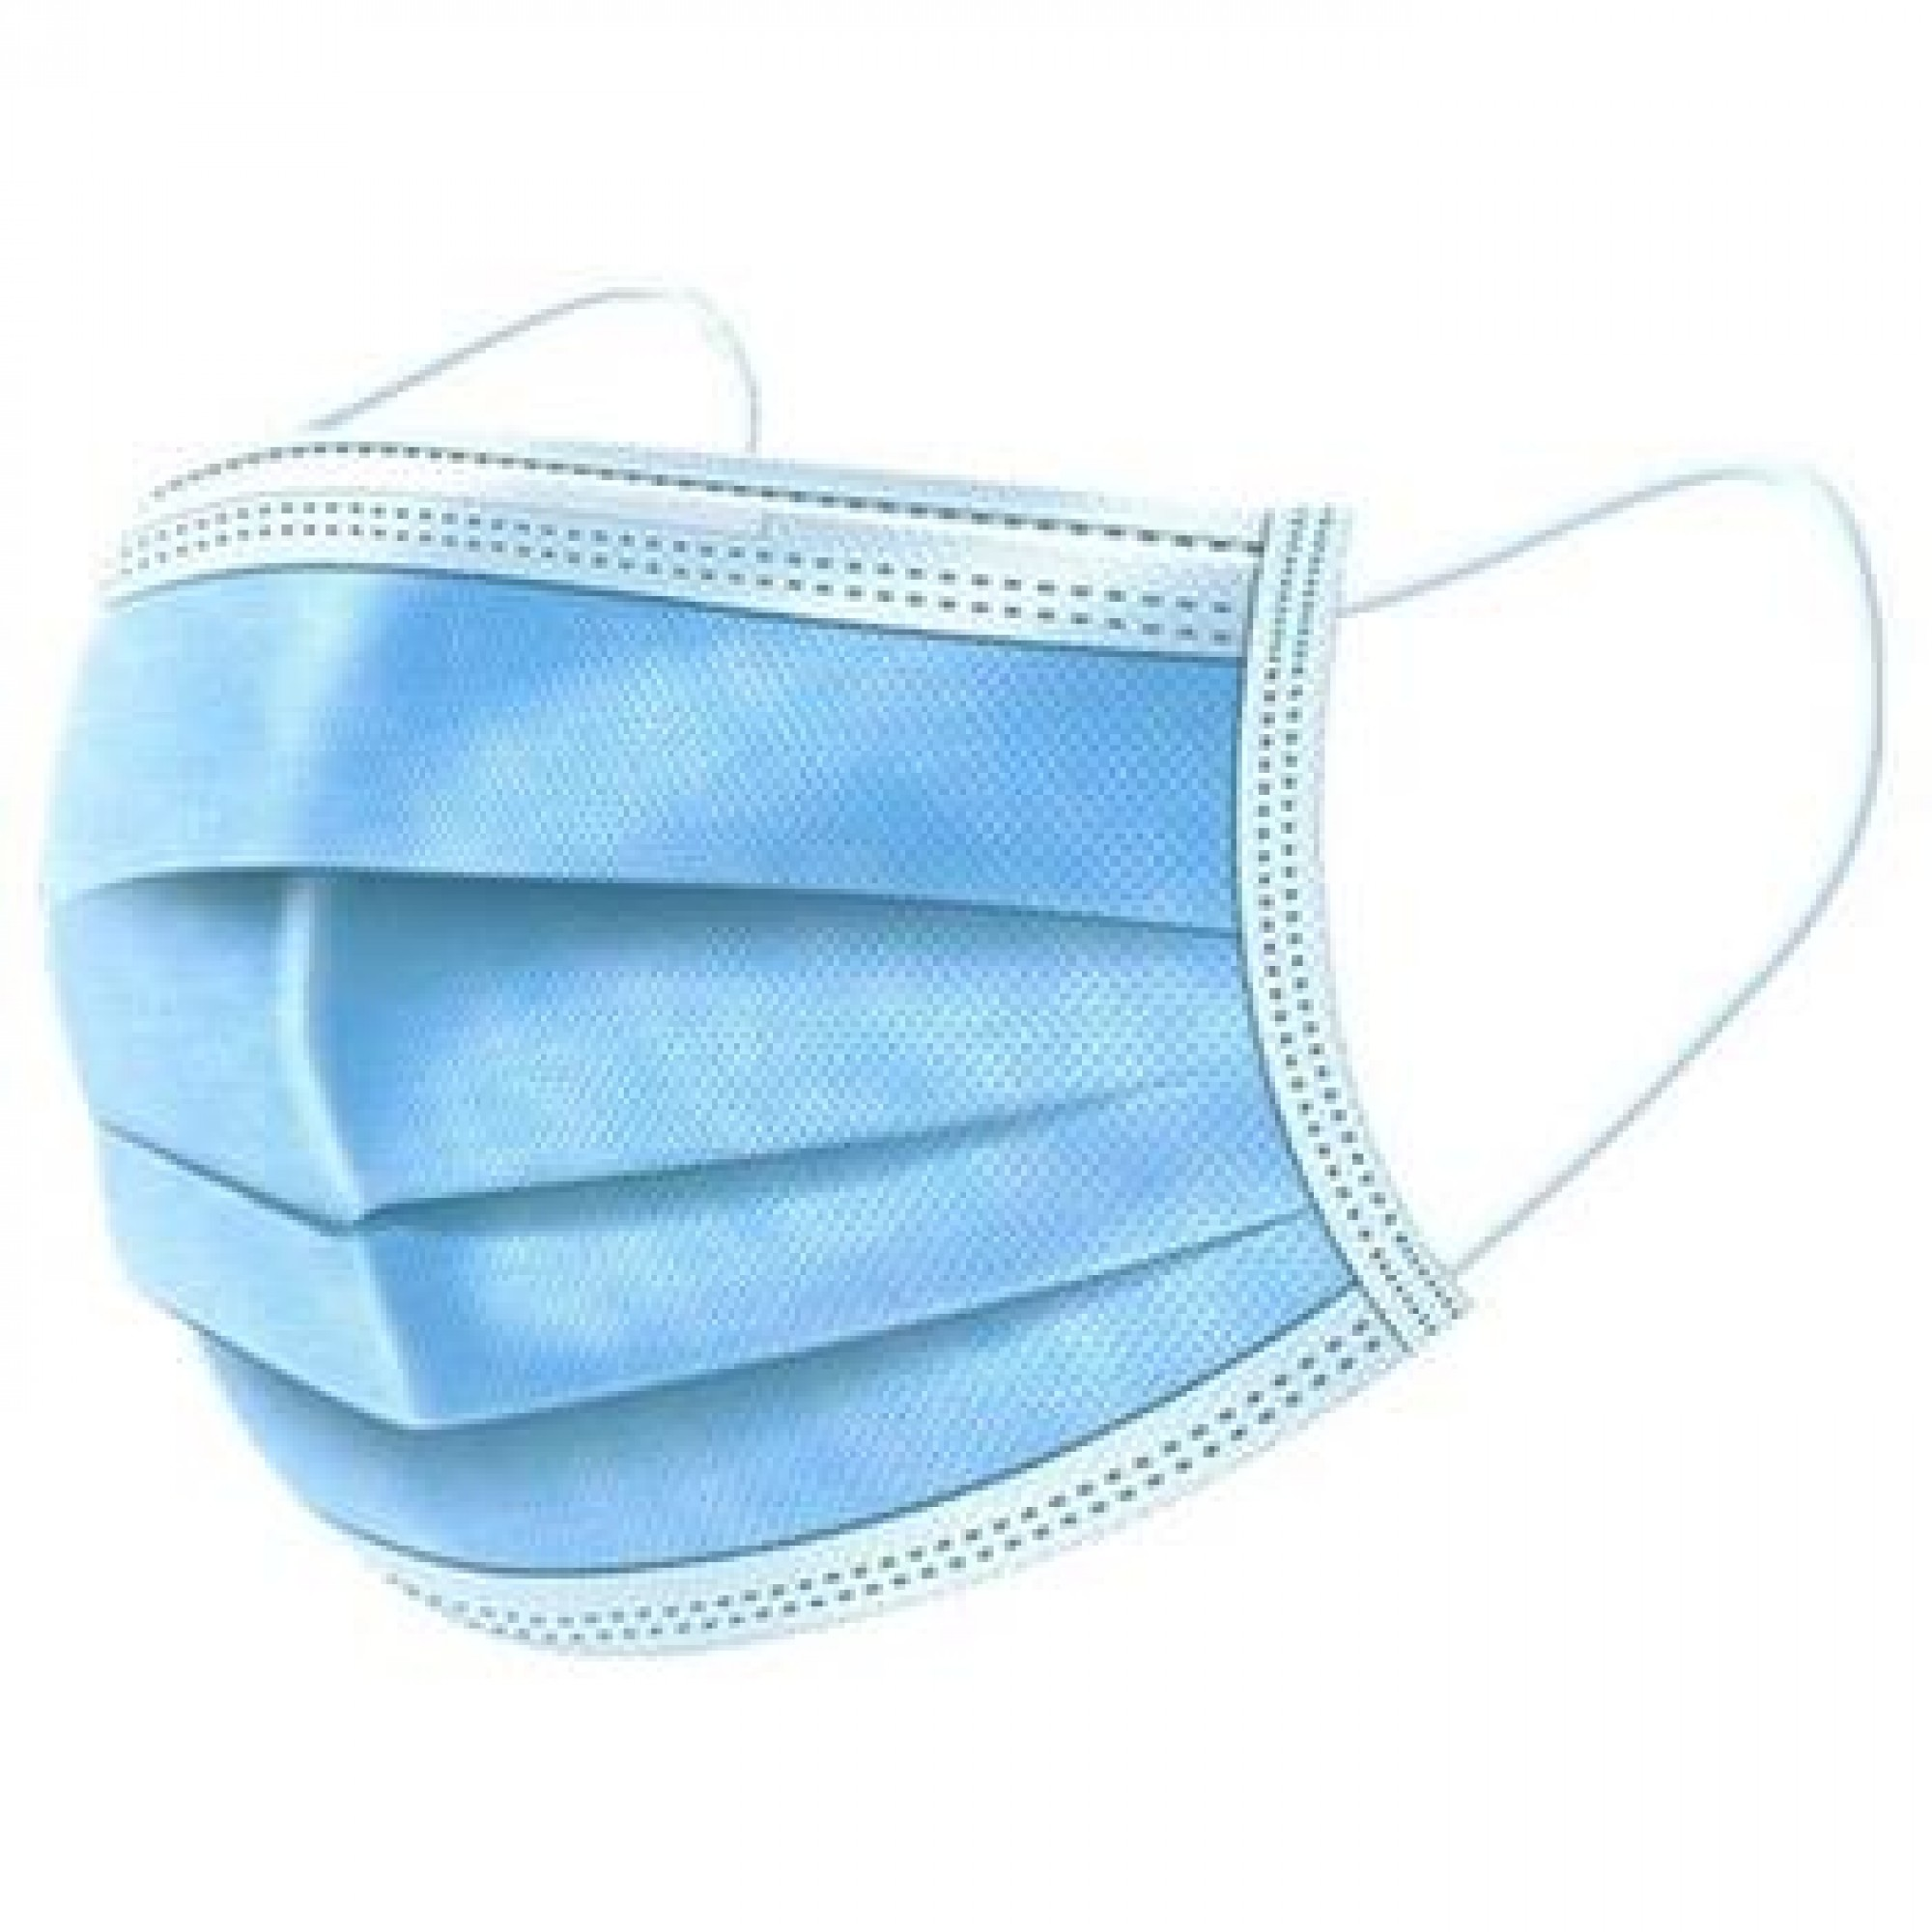 3-kārtu medicīniskā maska 028MMPK (TYPE IIR)